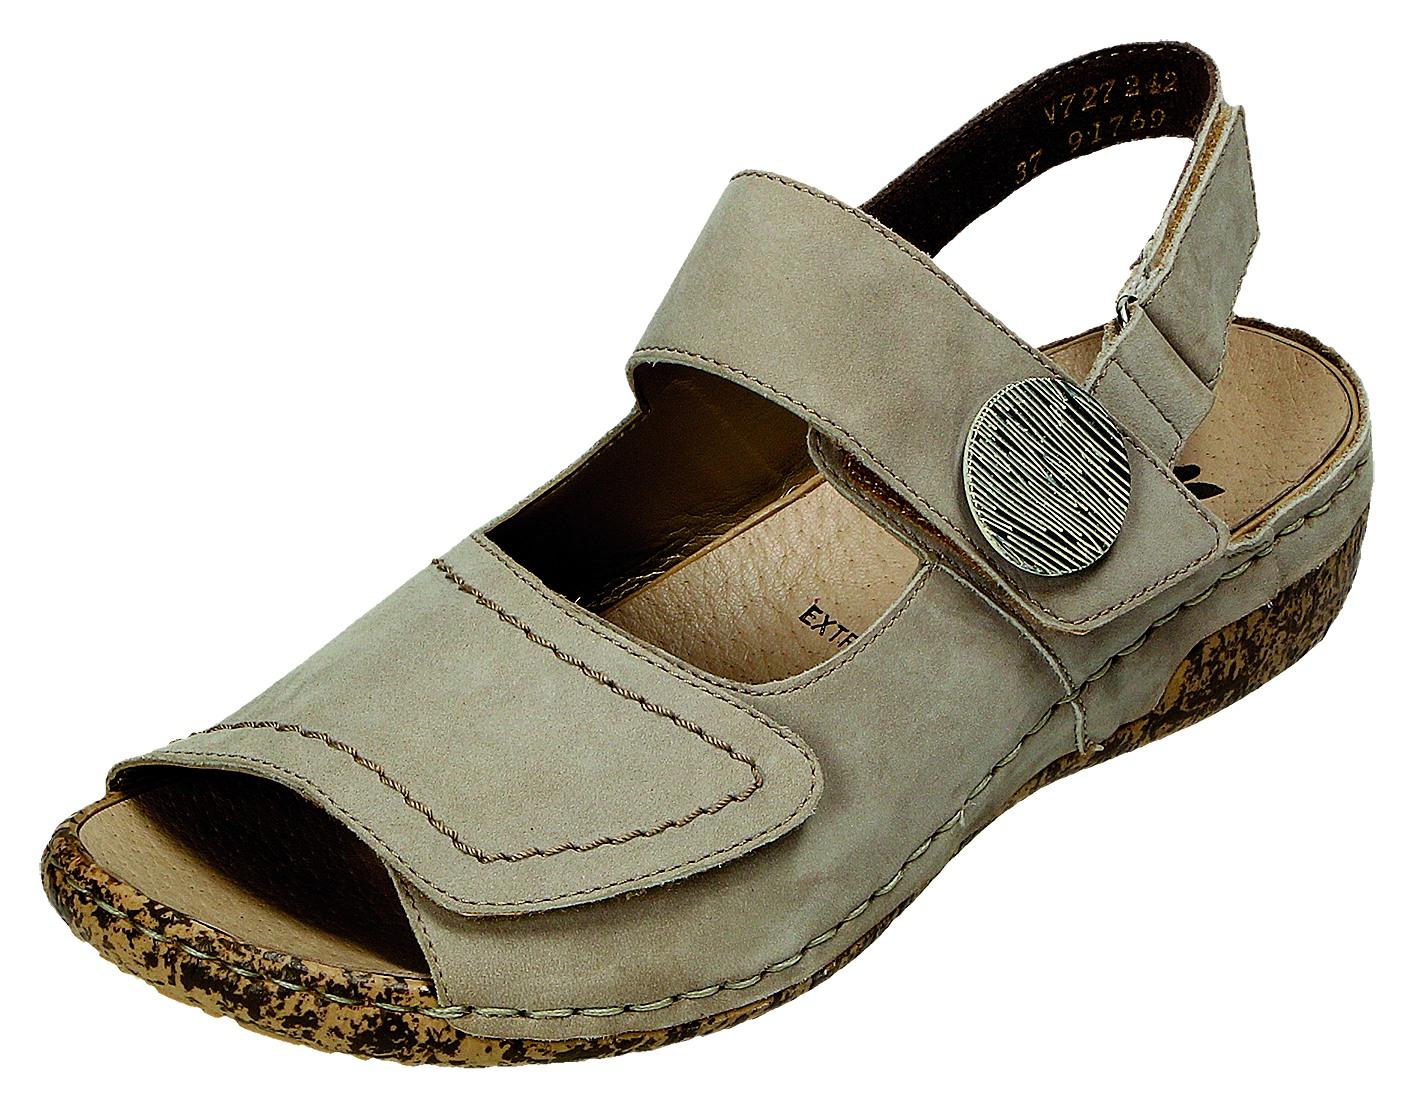 Rieker Damen Sandale-Pantolette D.Klettsand. Grau V7272 42 STEEL